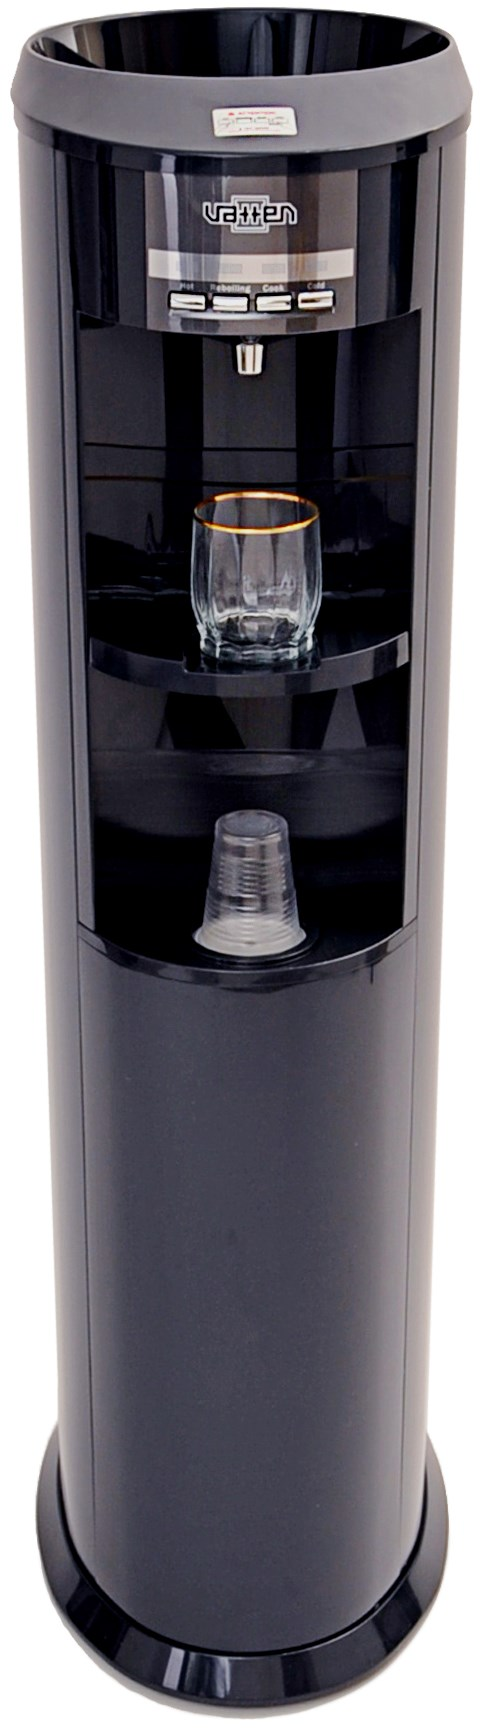 Кулер для воды VATTEN V803NKD